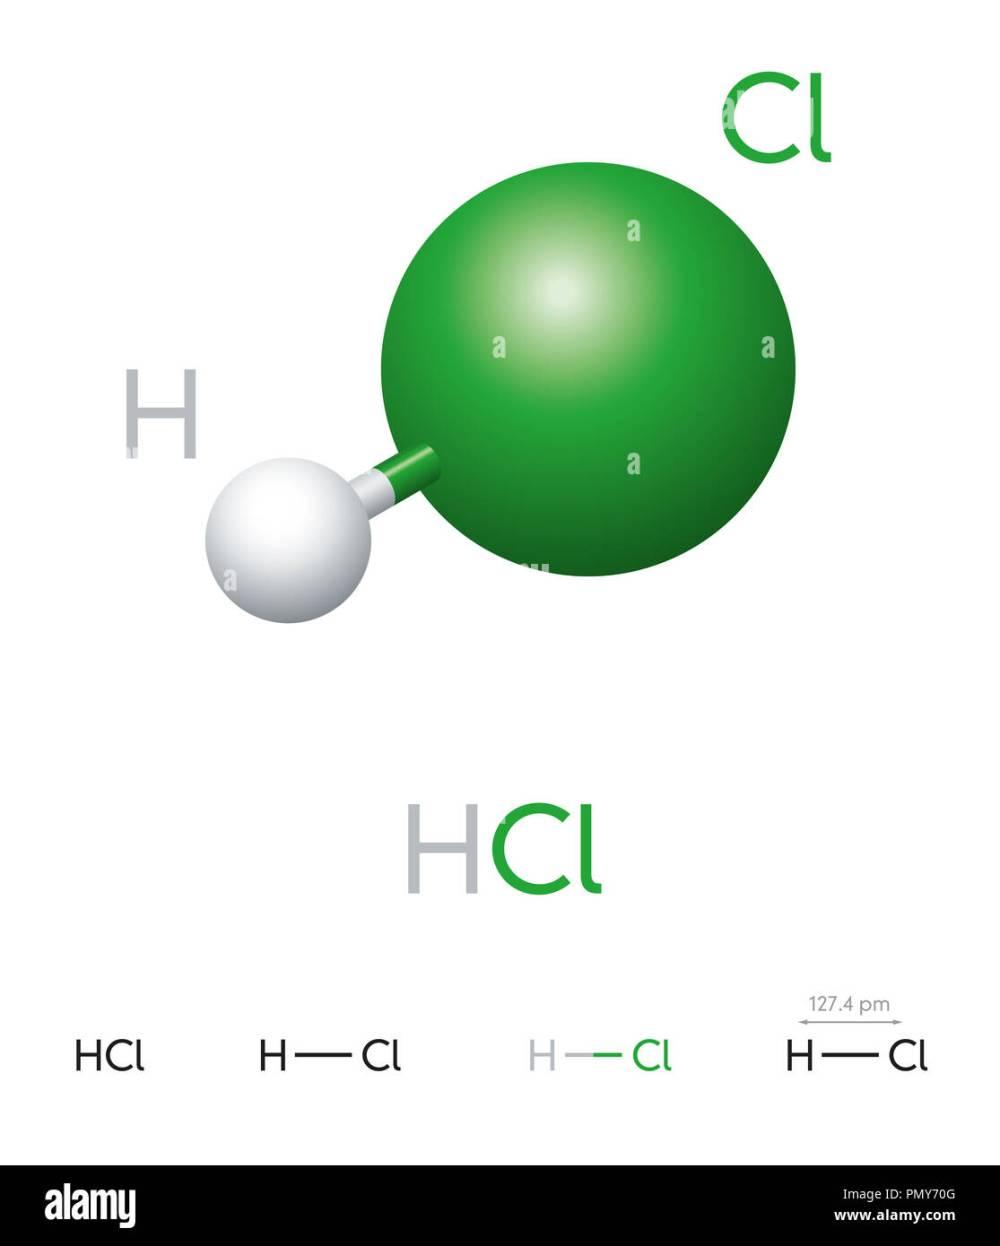 medium resolution of hydrogen chloride molecule model chemical formula ball and stick model geometric structure and structural formula hydrogen halide